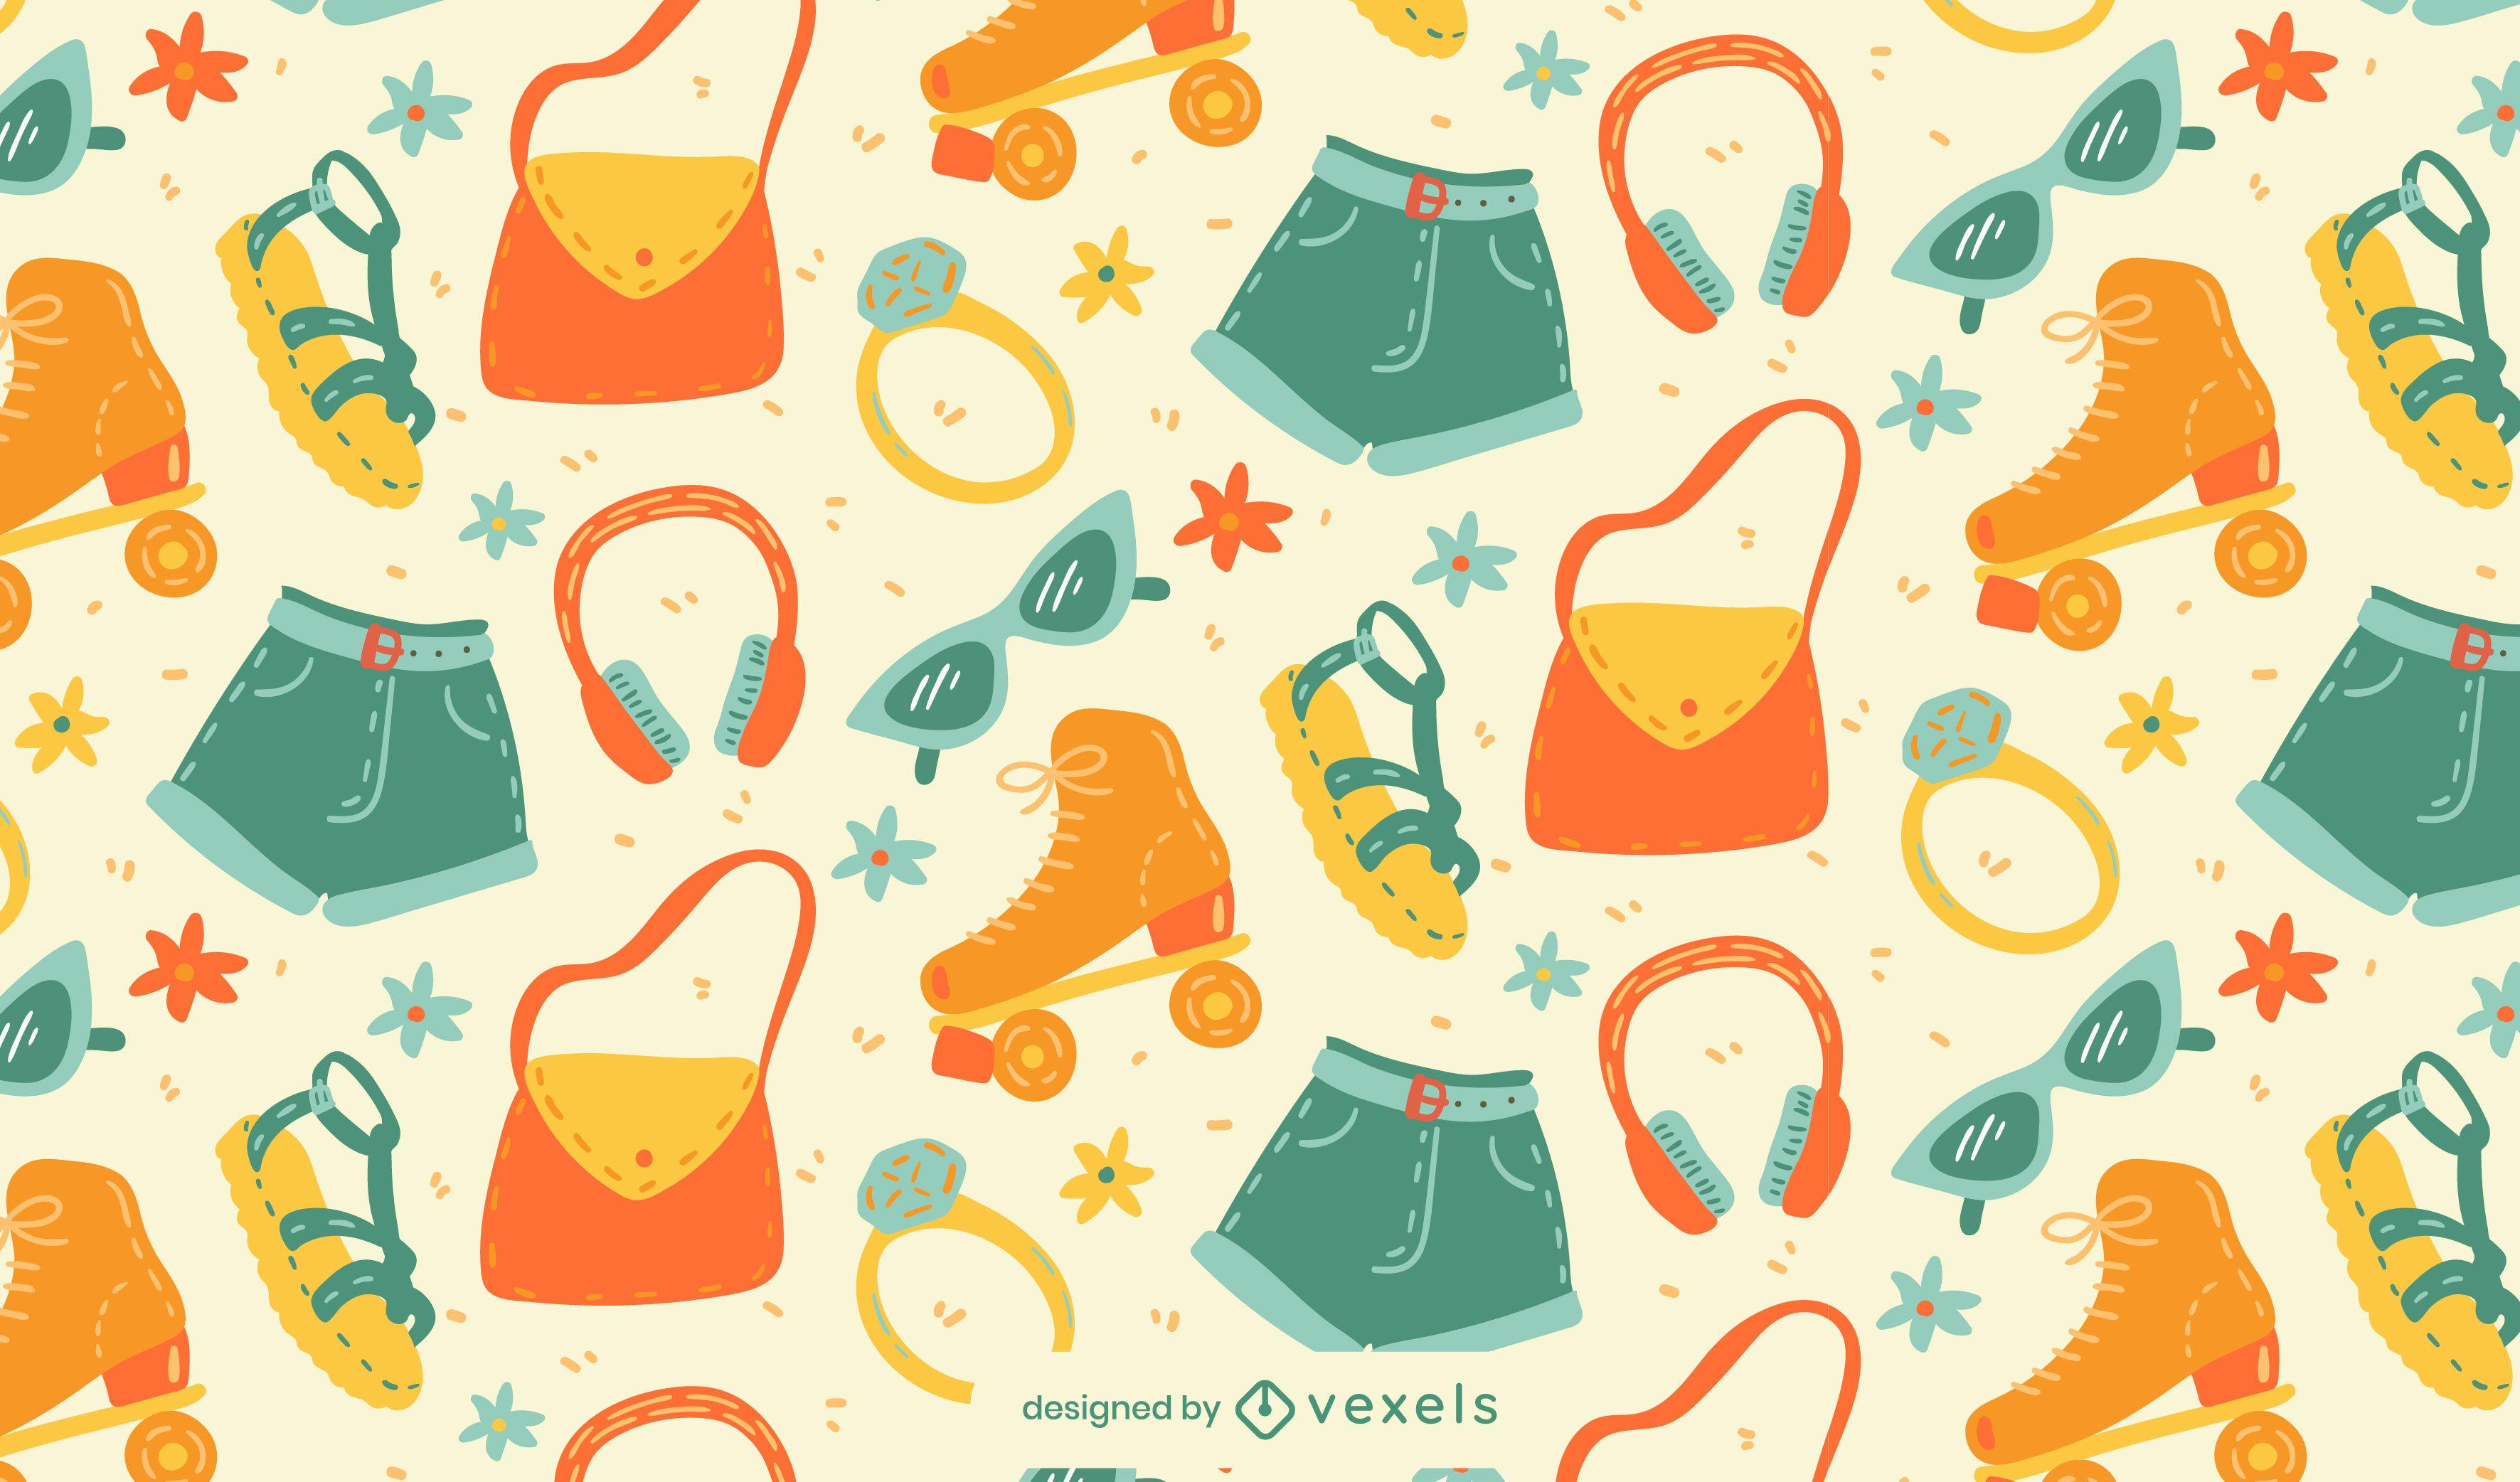 Spaß-Sommer-Retro-Elemente-Muster-Design